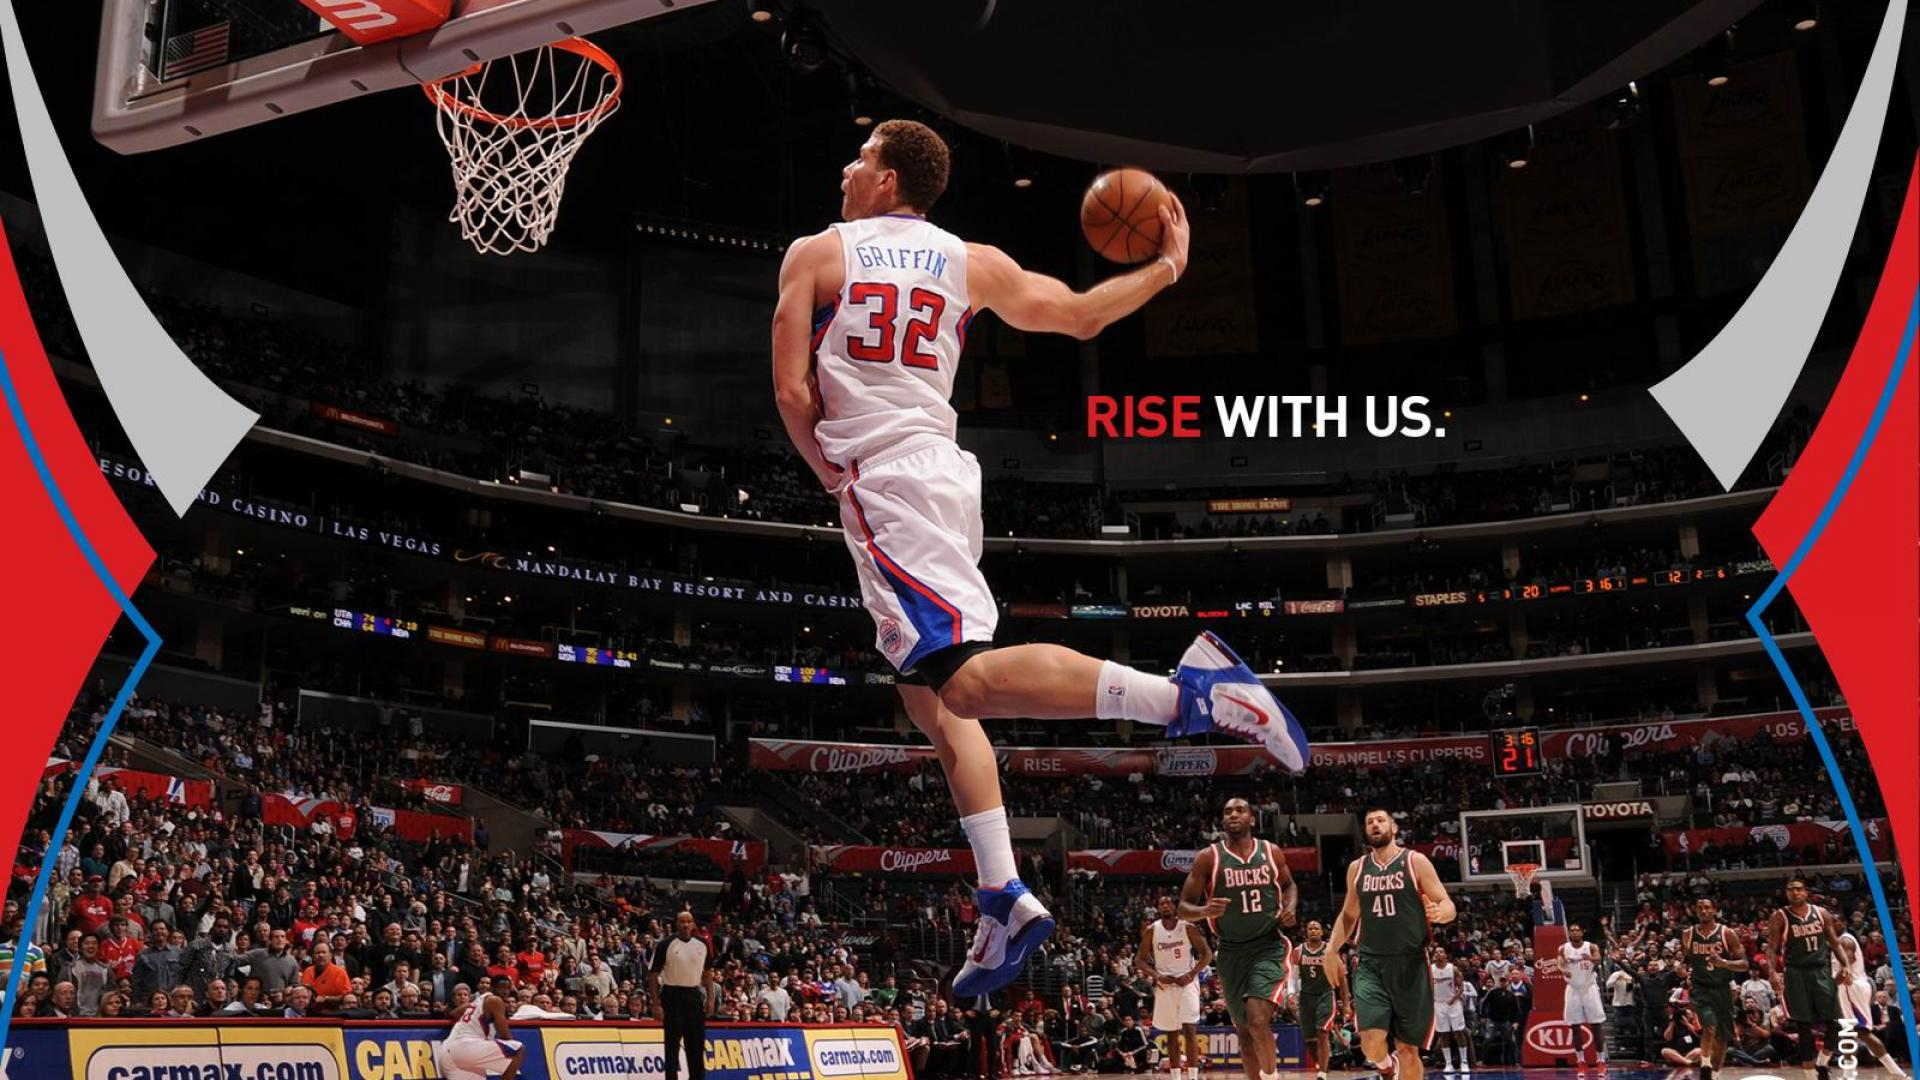 Slamdunk Blake Griffin Los Angeles Clippers Nba Slam Dunk U S A 271556 1920x1080